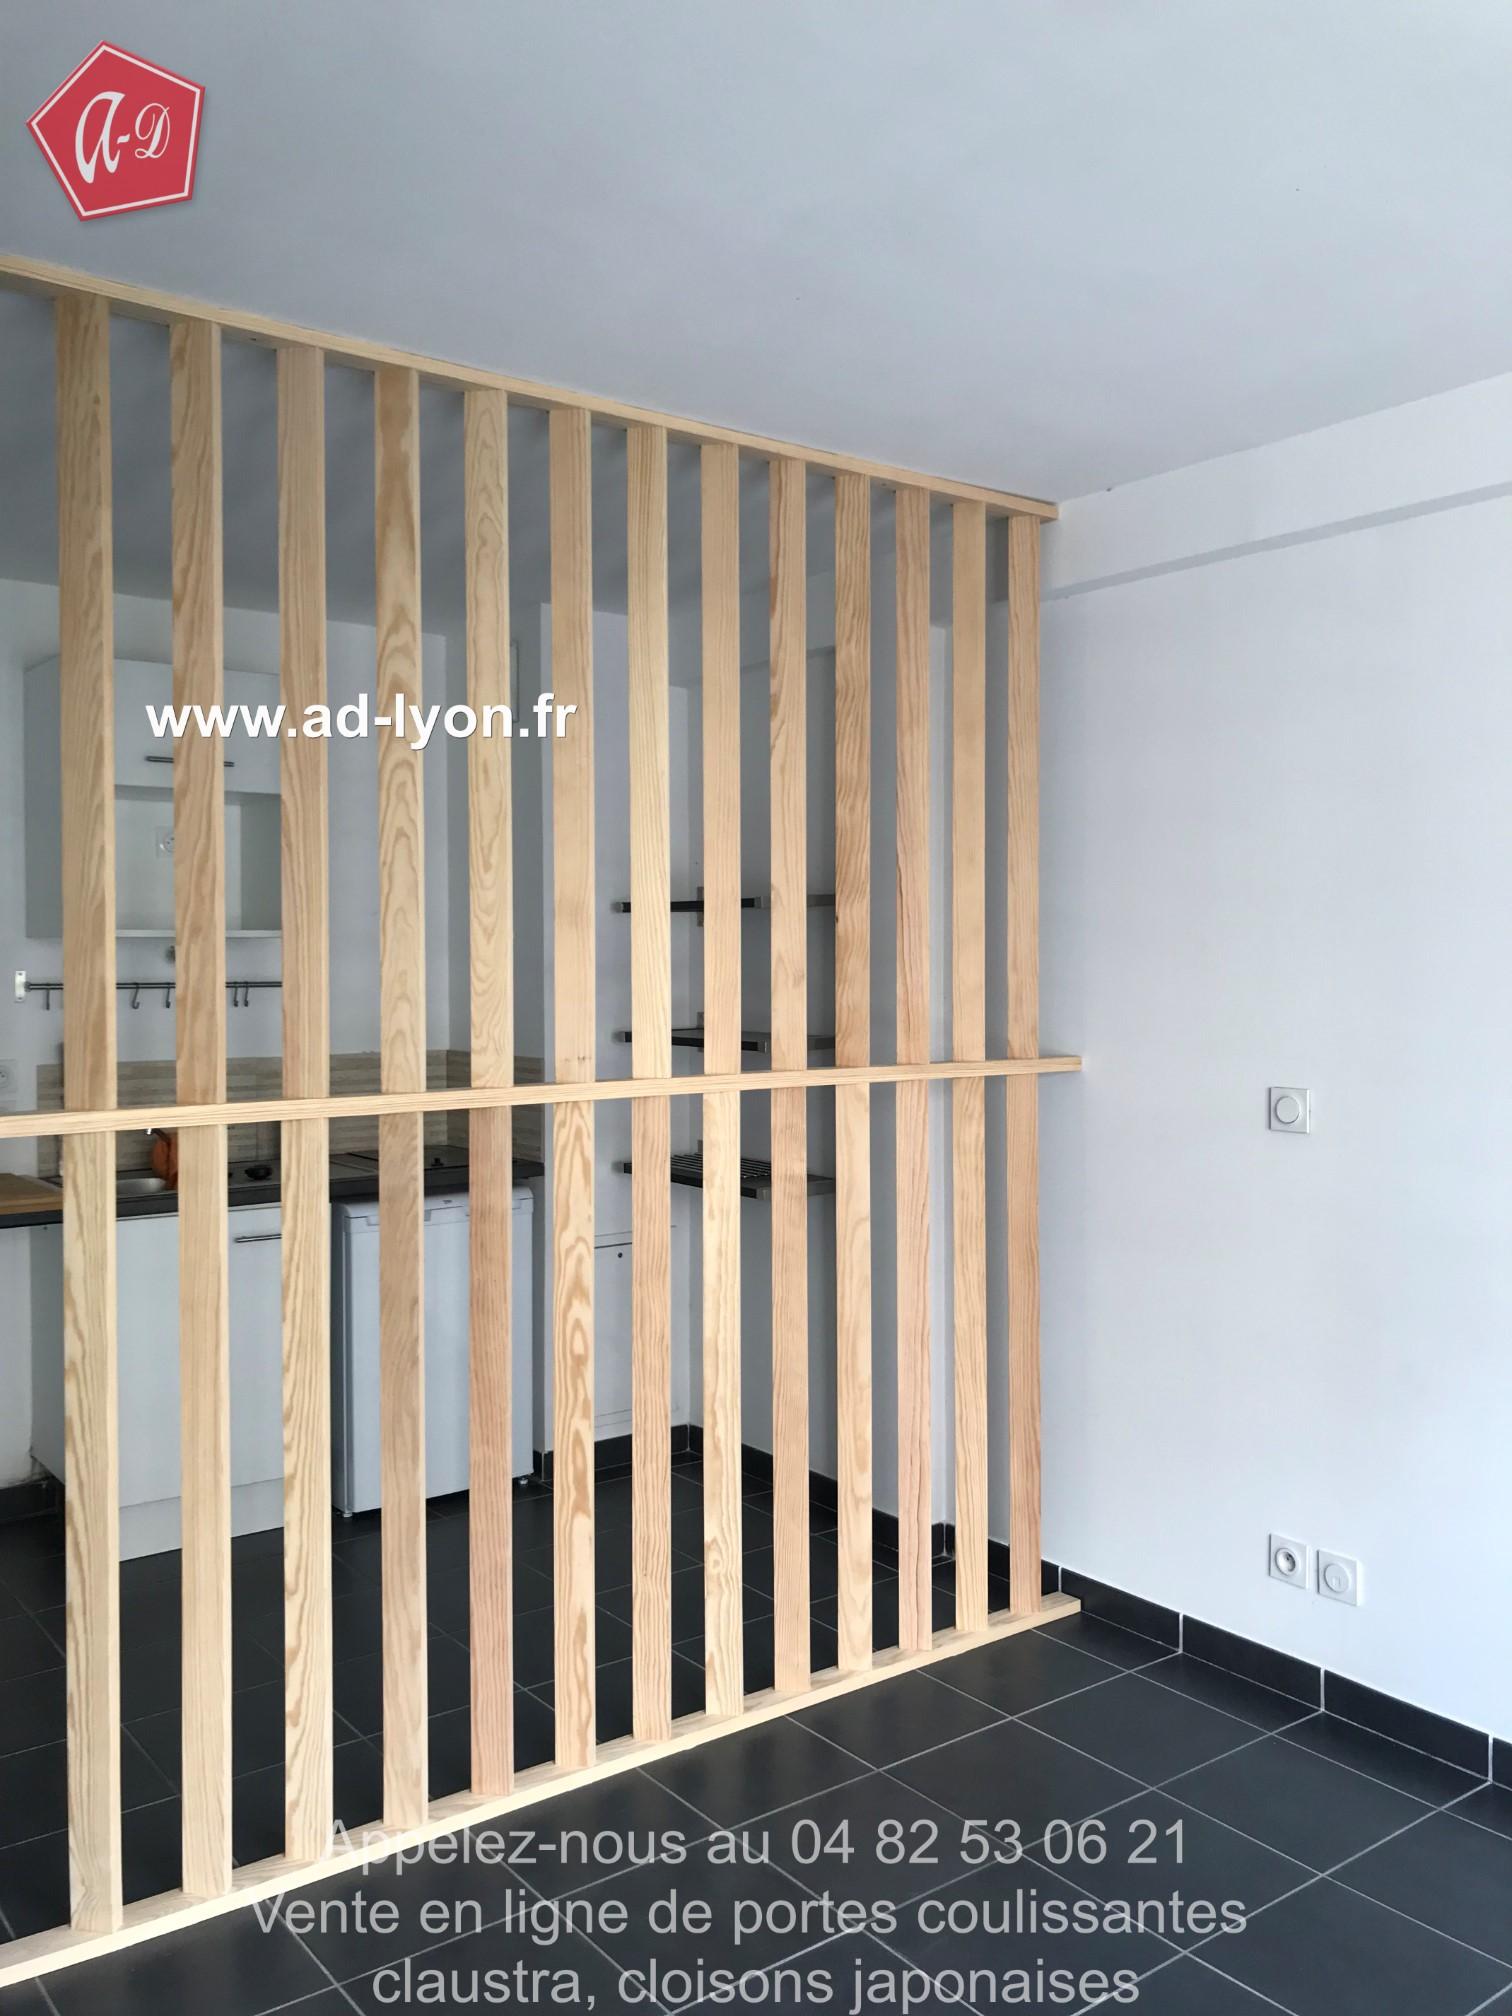 claustra en palette top salon de jardin palette bois luxe images salon de jardin palette en. Black Bedroom Furniture Sets. Home Design Ideas